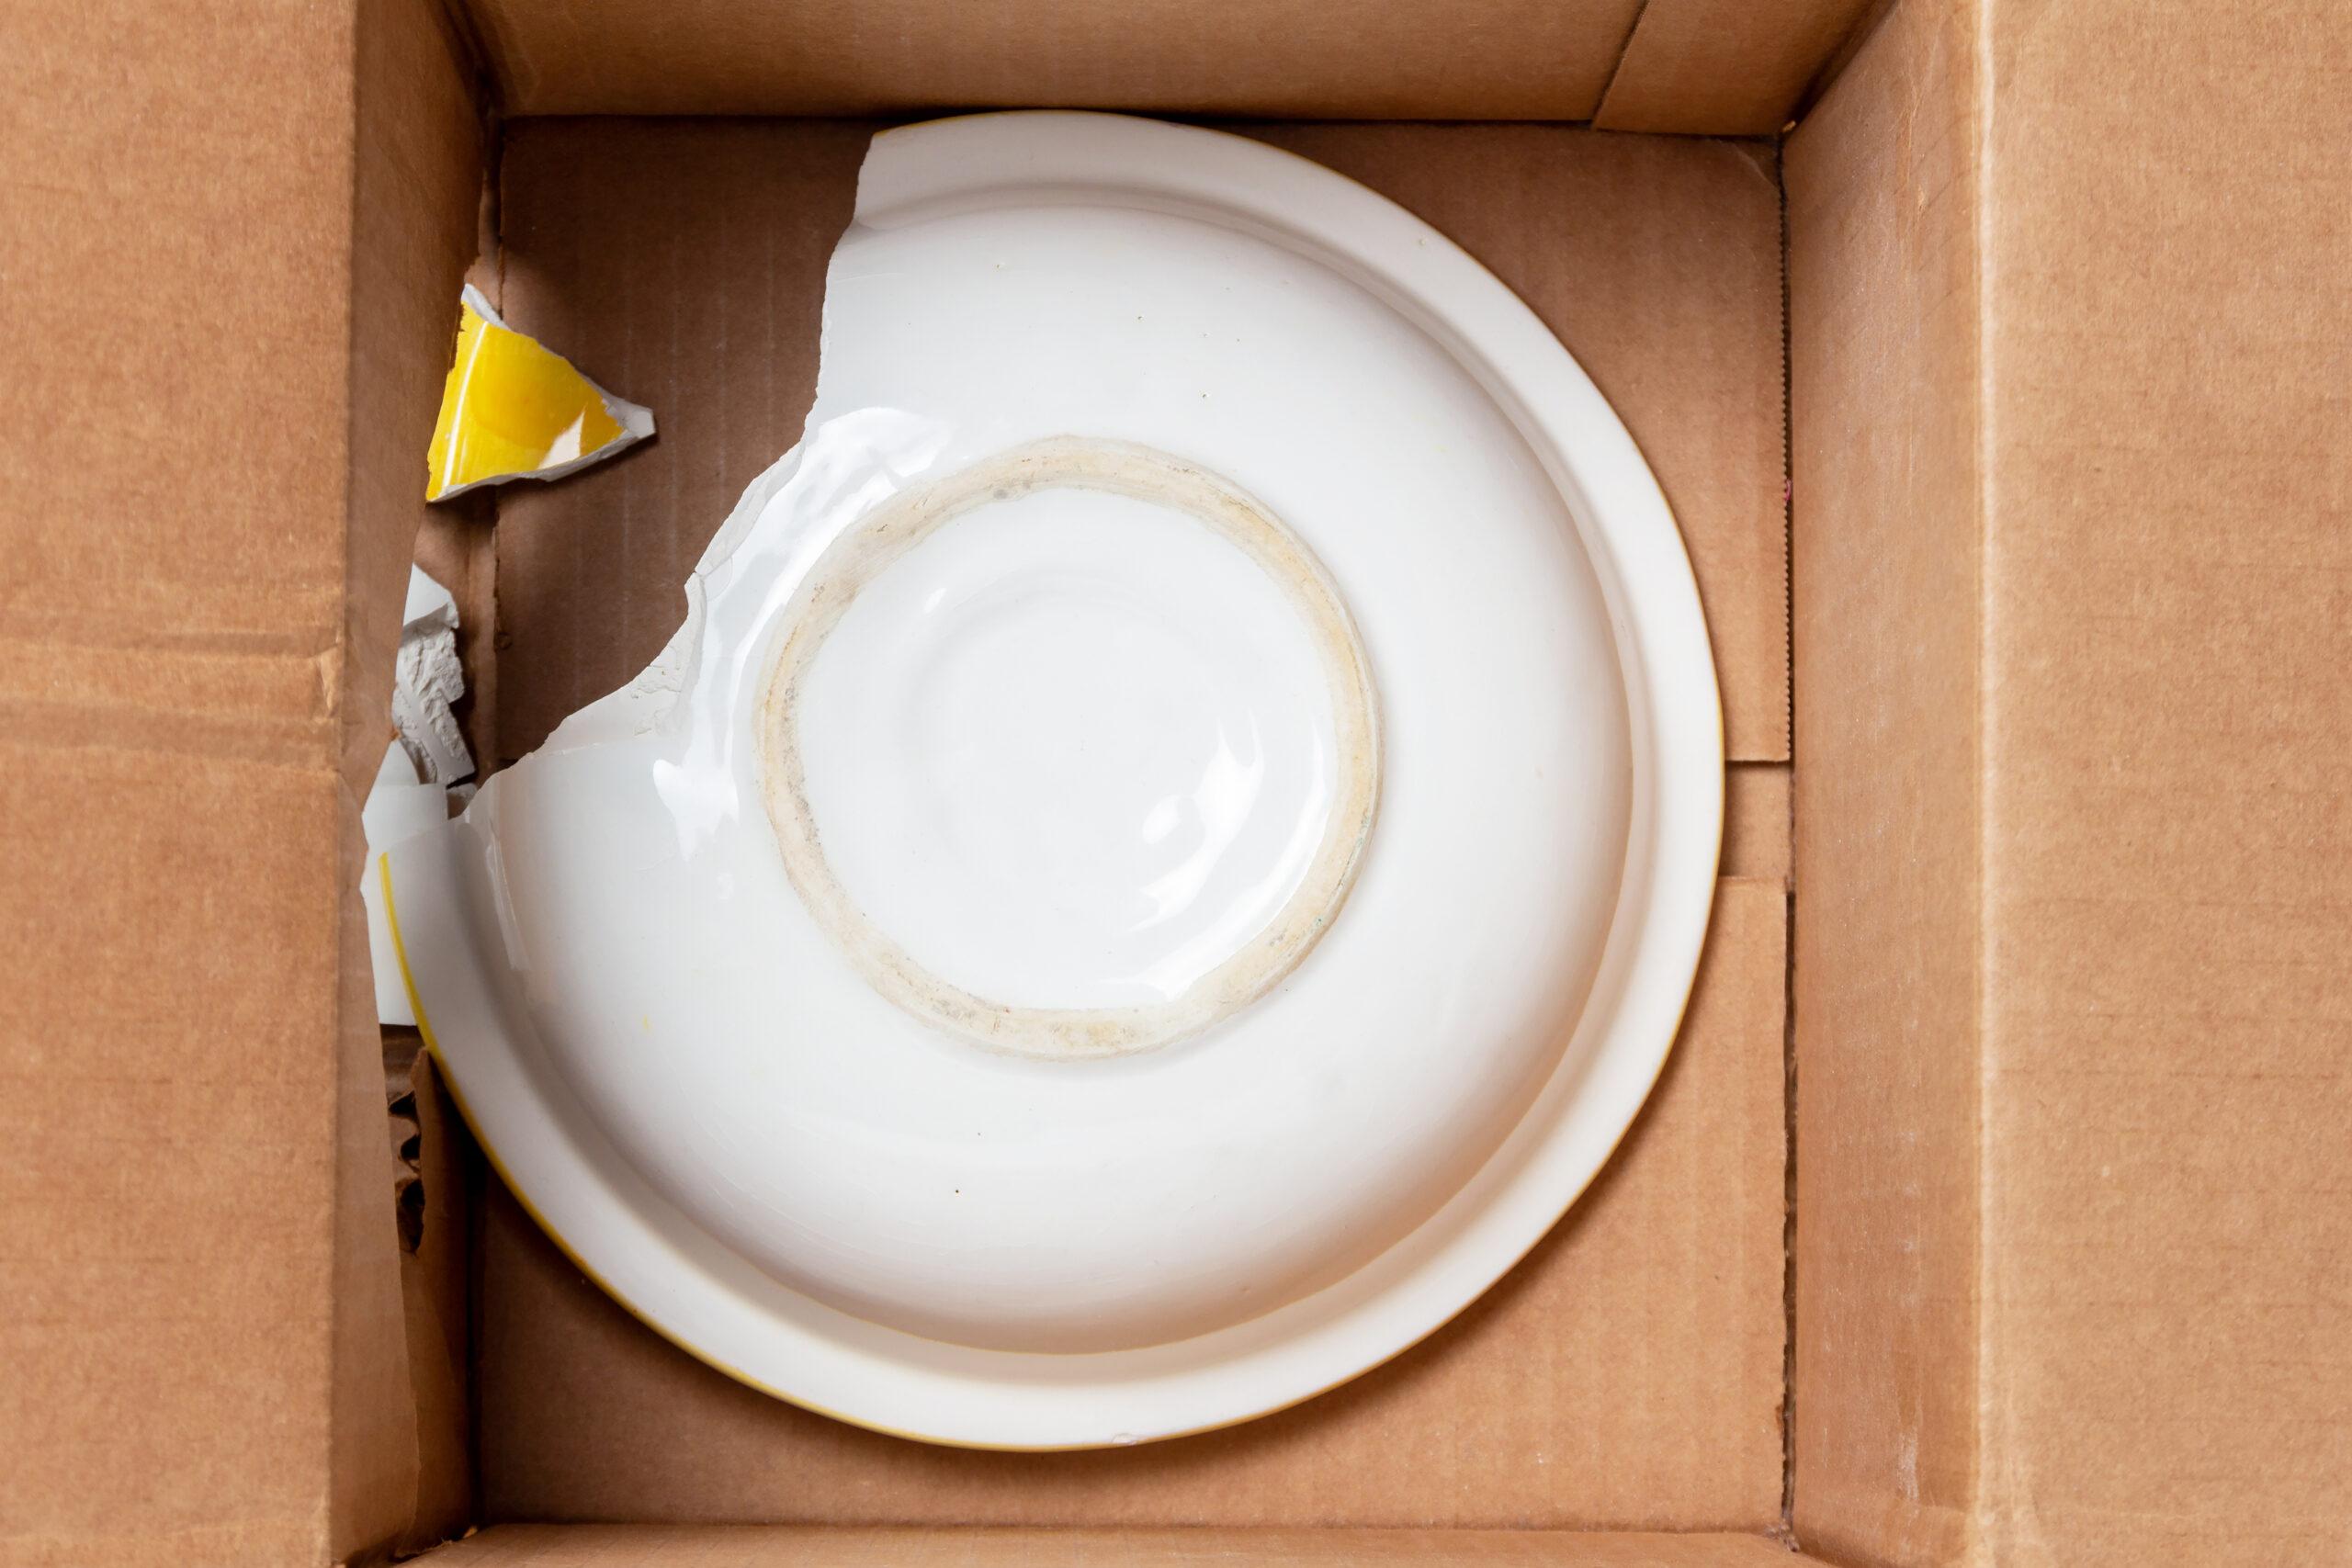 Broken plate inside box